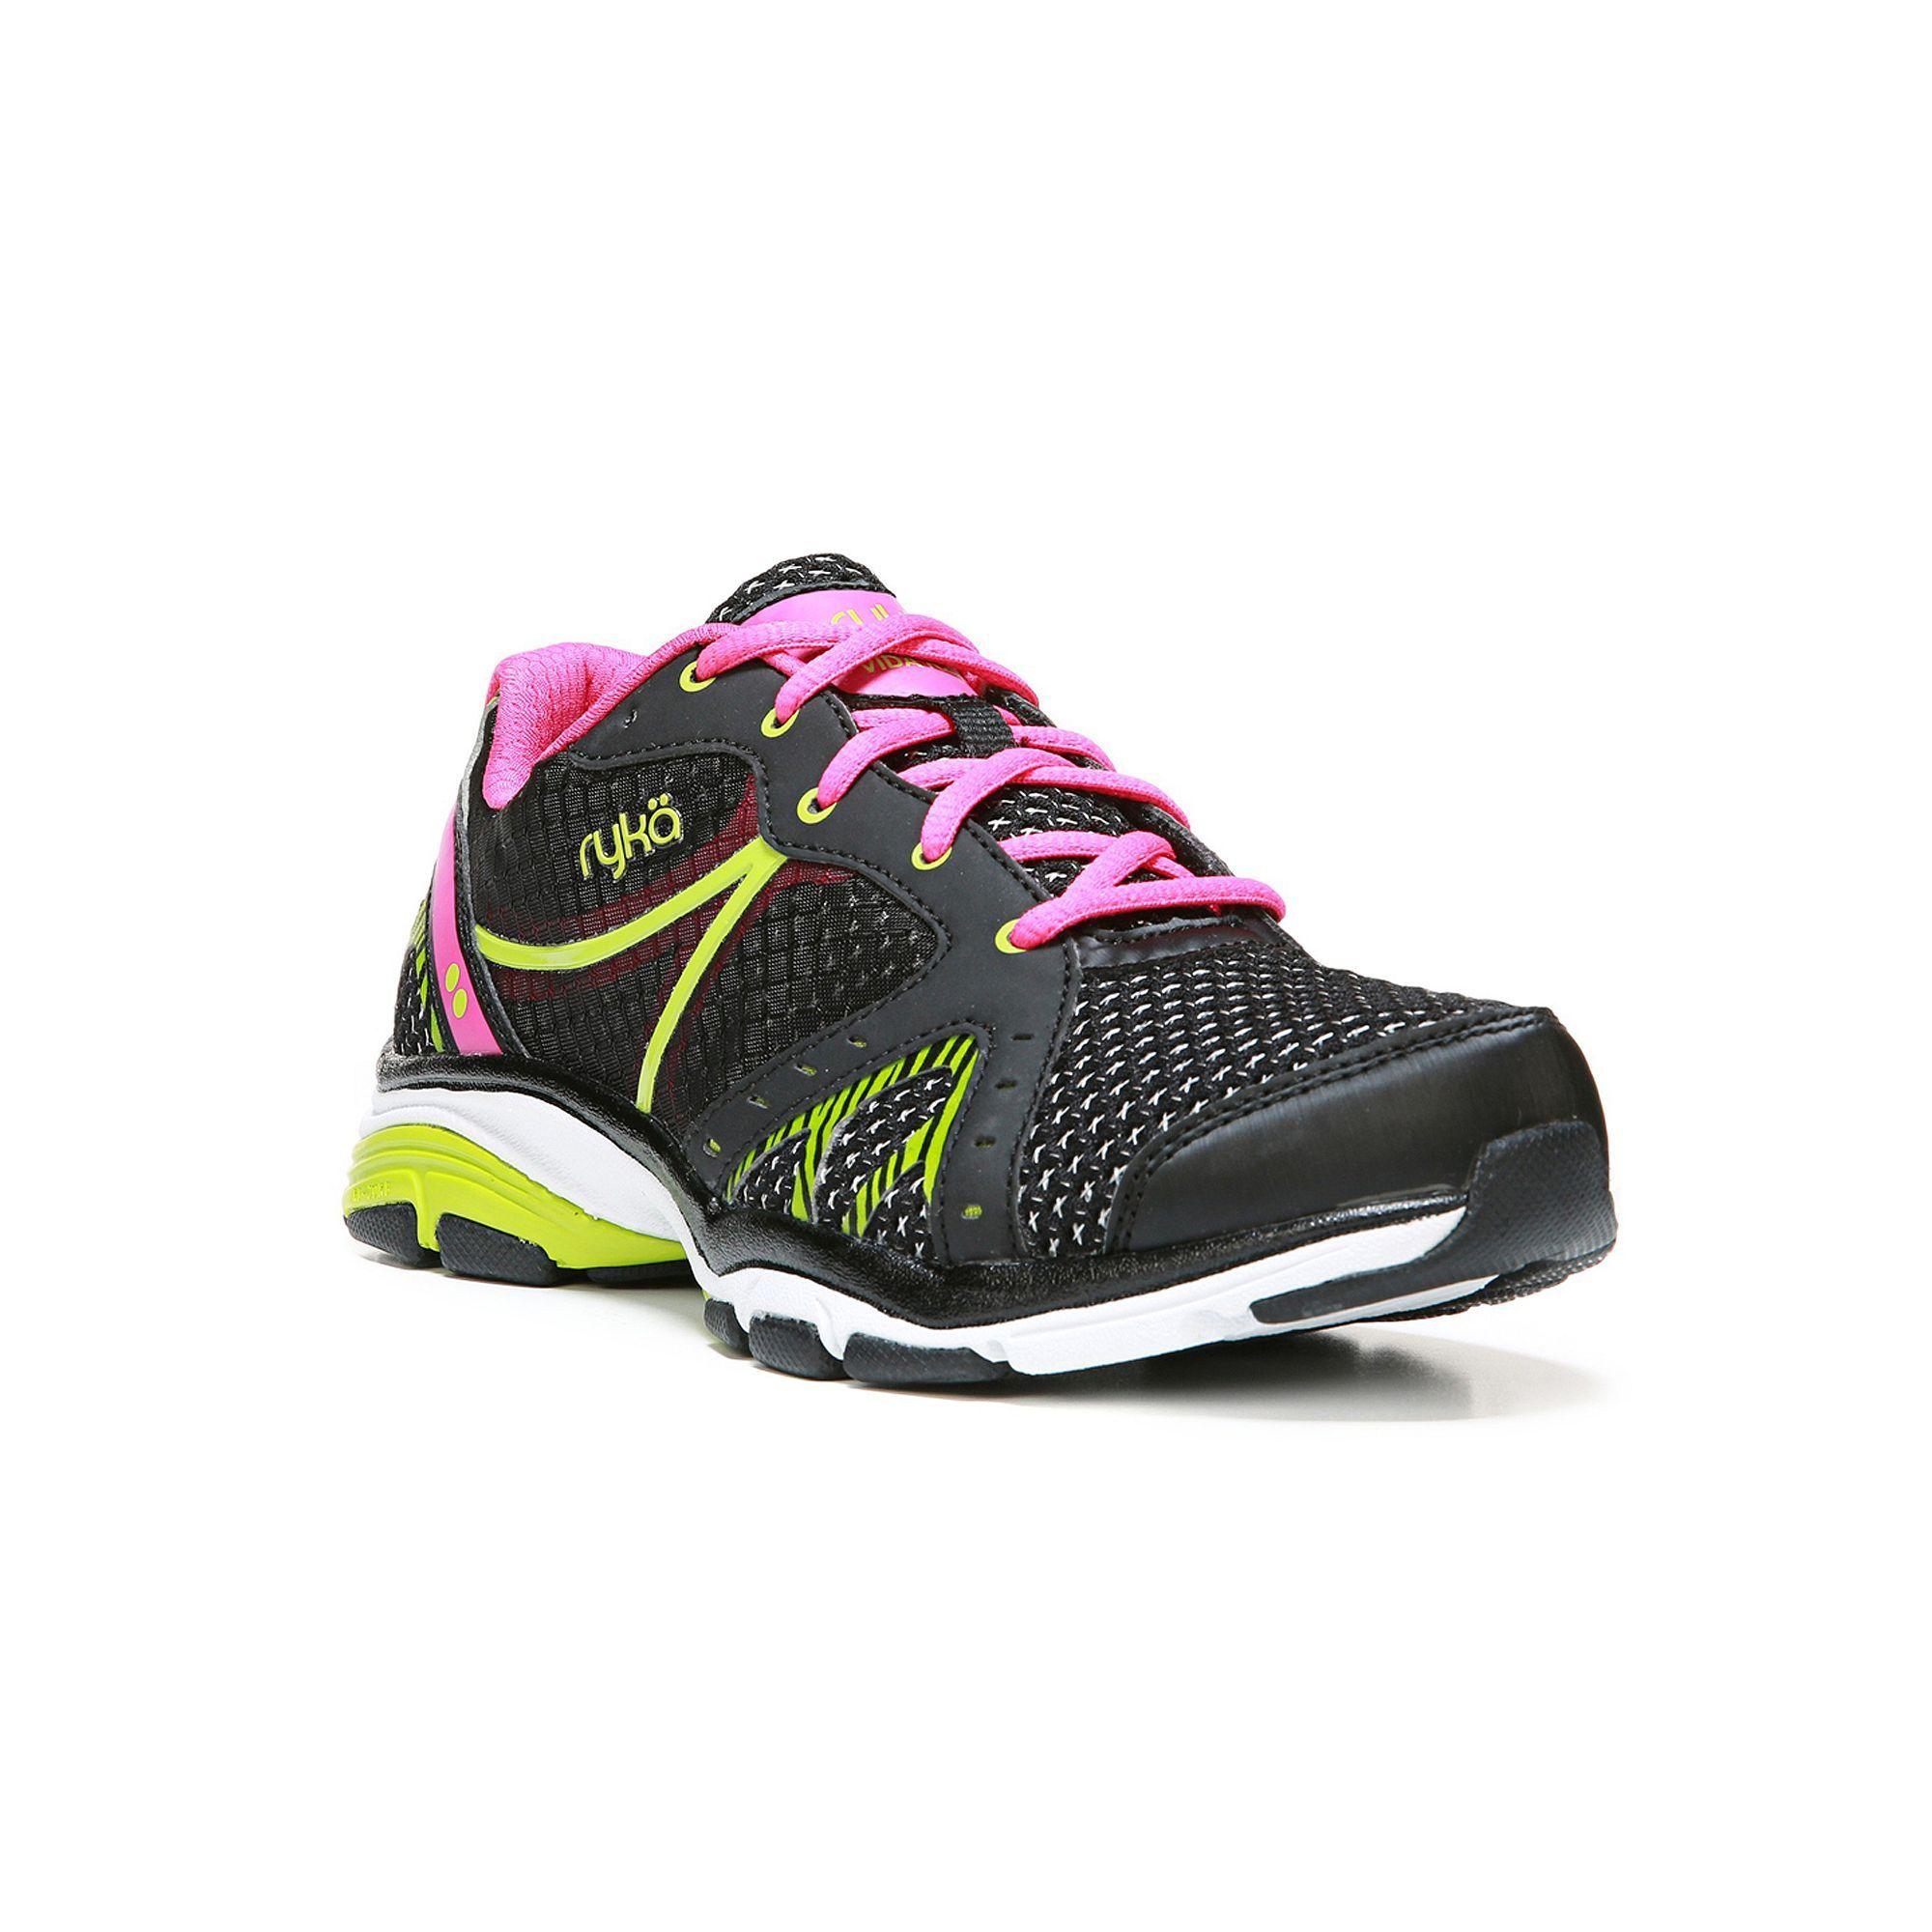 Ryka Vida RZX Women's Training Shoes, Size: medium (10), Oxford